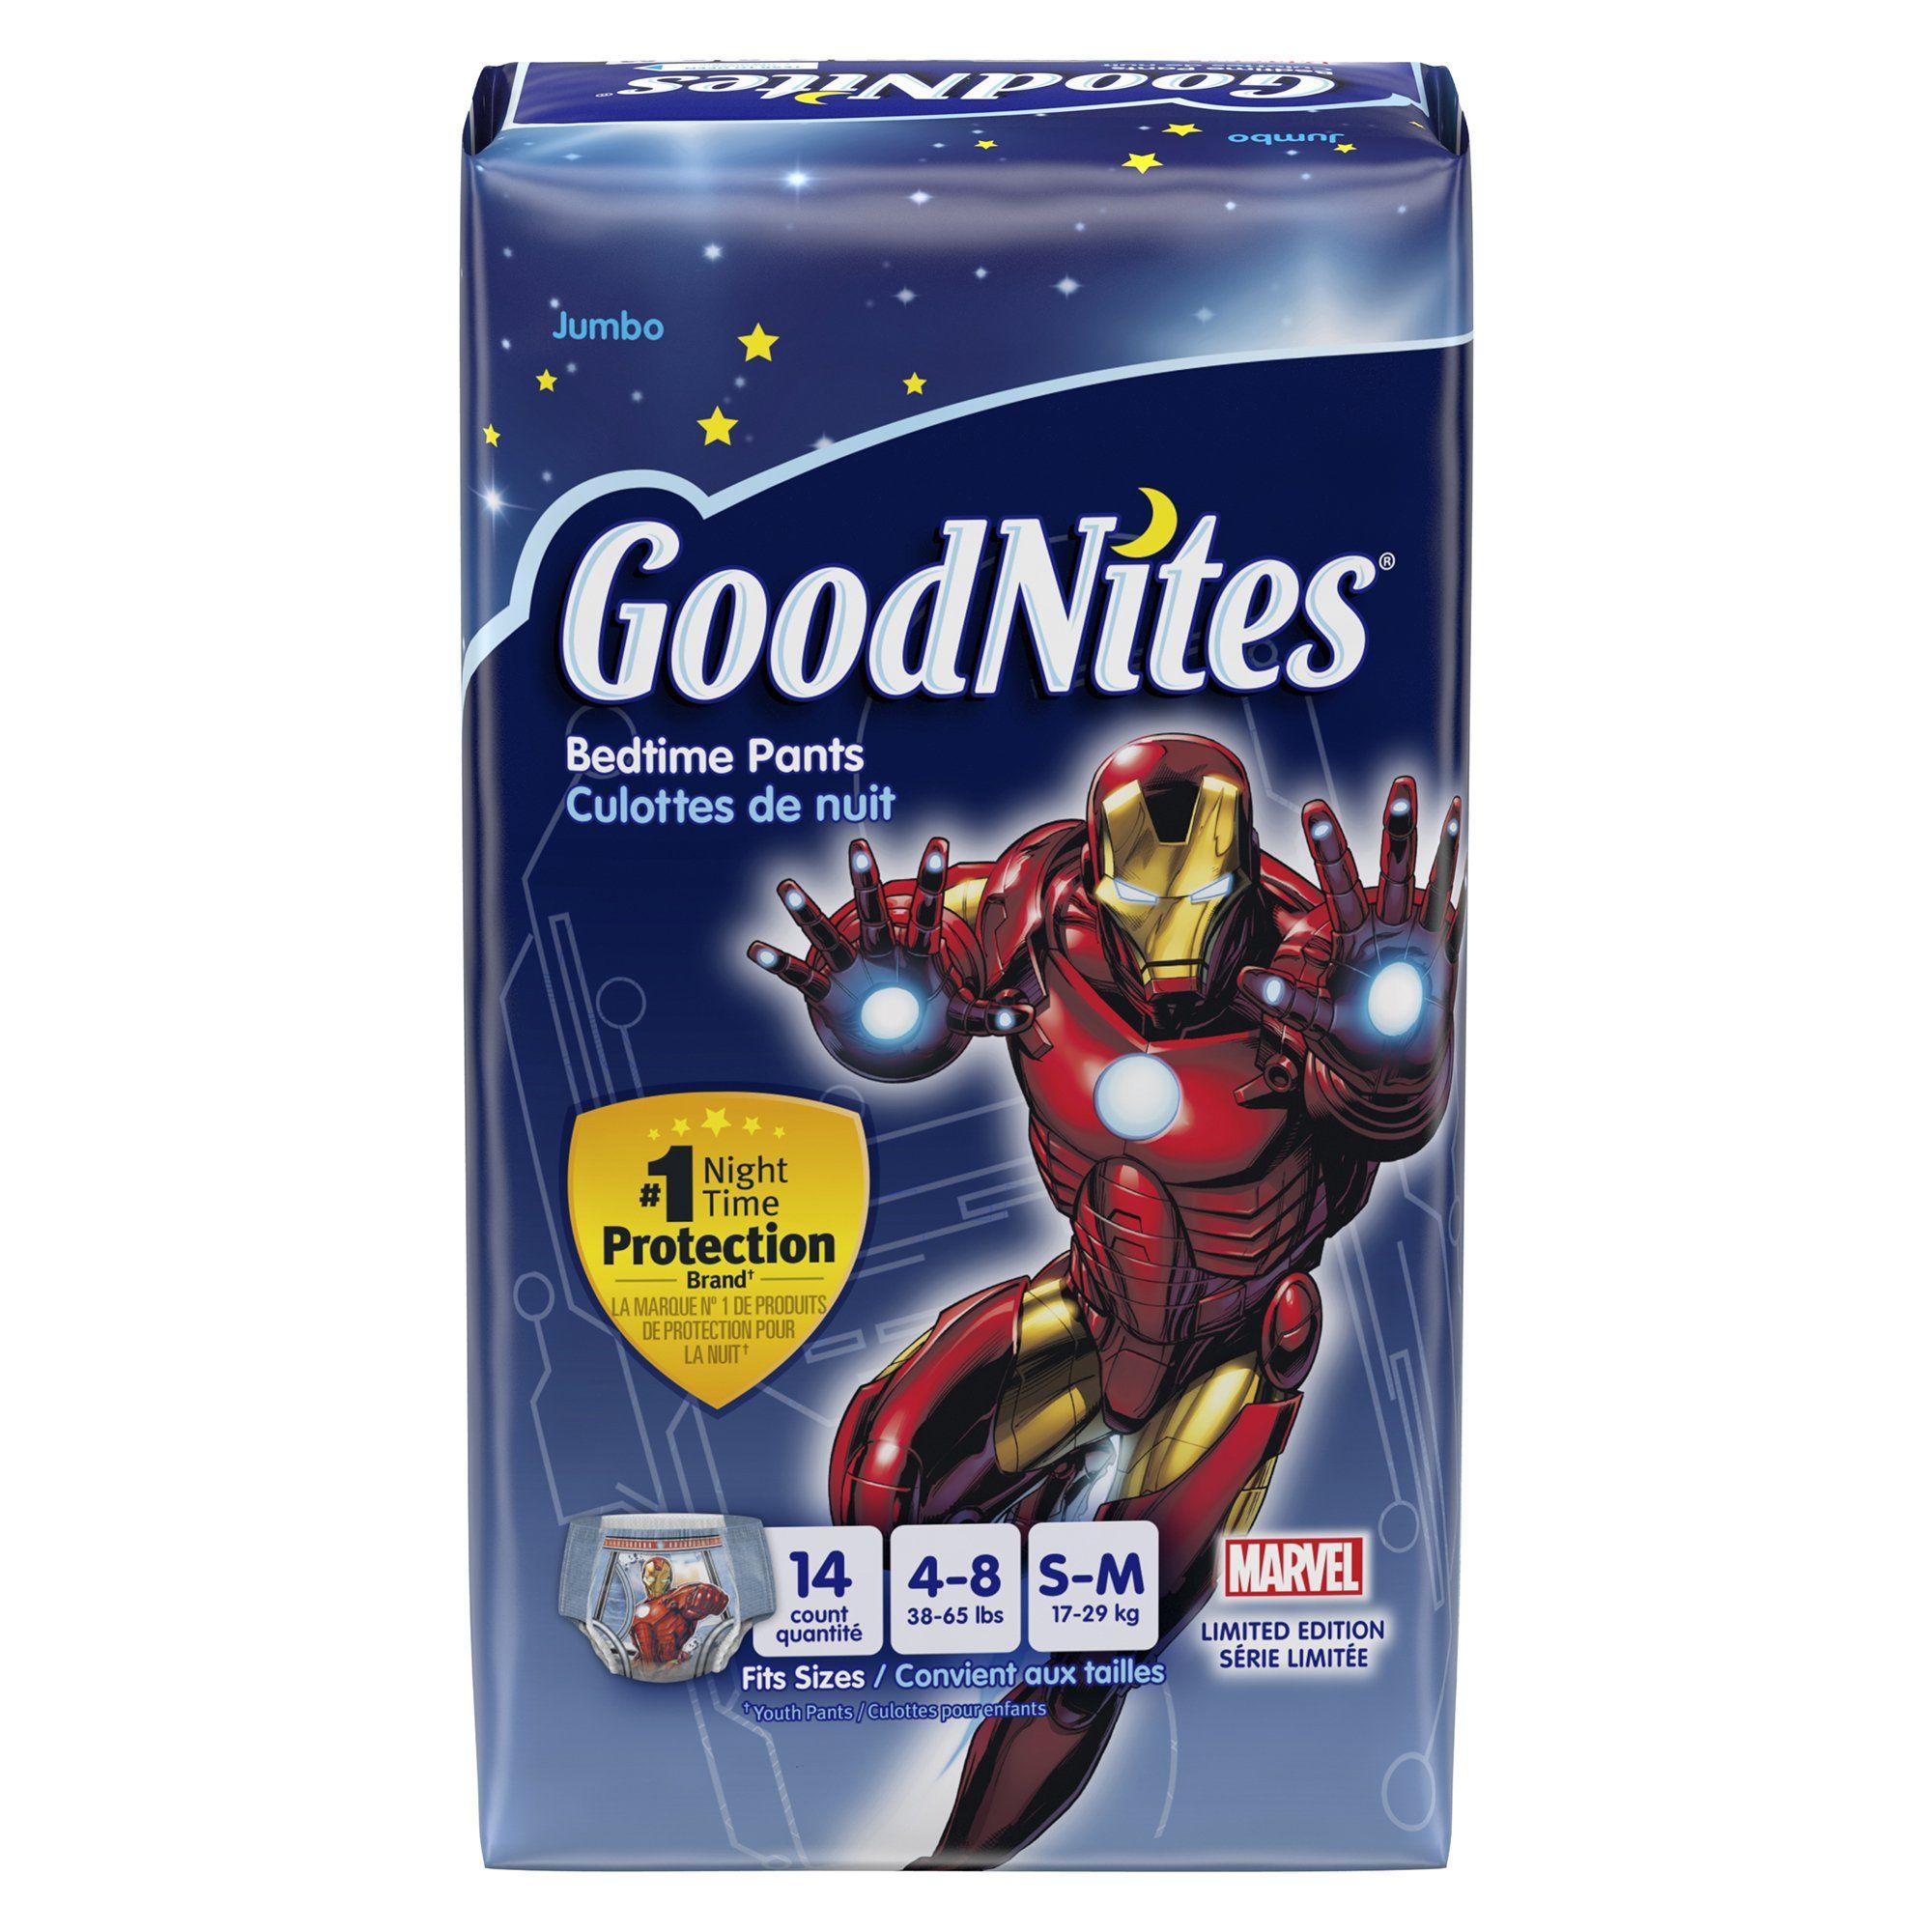 Goodnites Underwear - Boy - Small - 14 ct. GoodNites Bedtime Pants ...